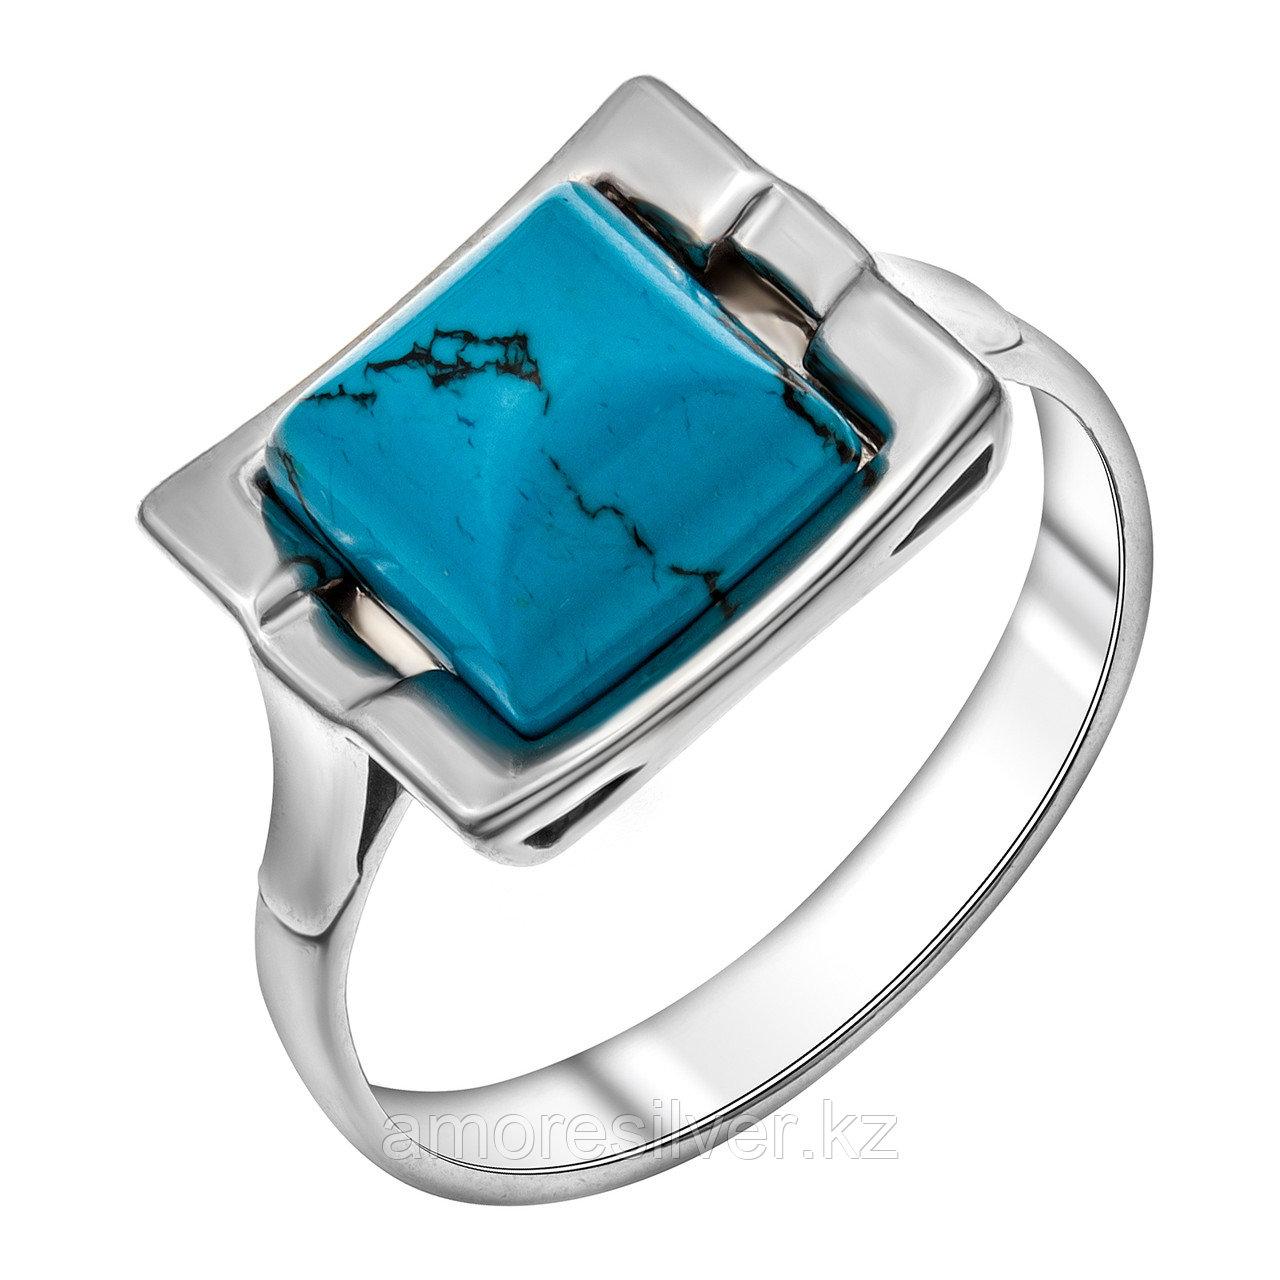 Кольцо Darvin серебро с родием, бирюза синт., , квадрат 920071002aa размеры - 17,5